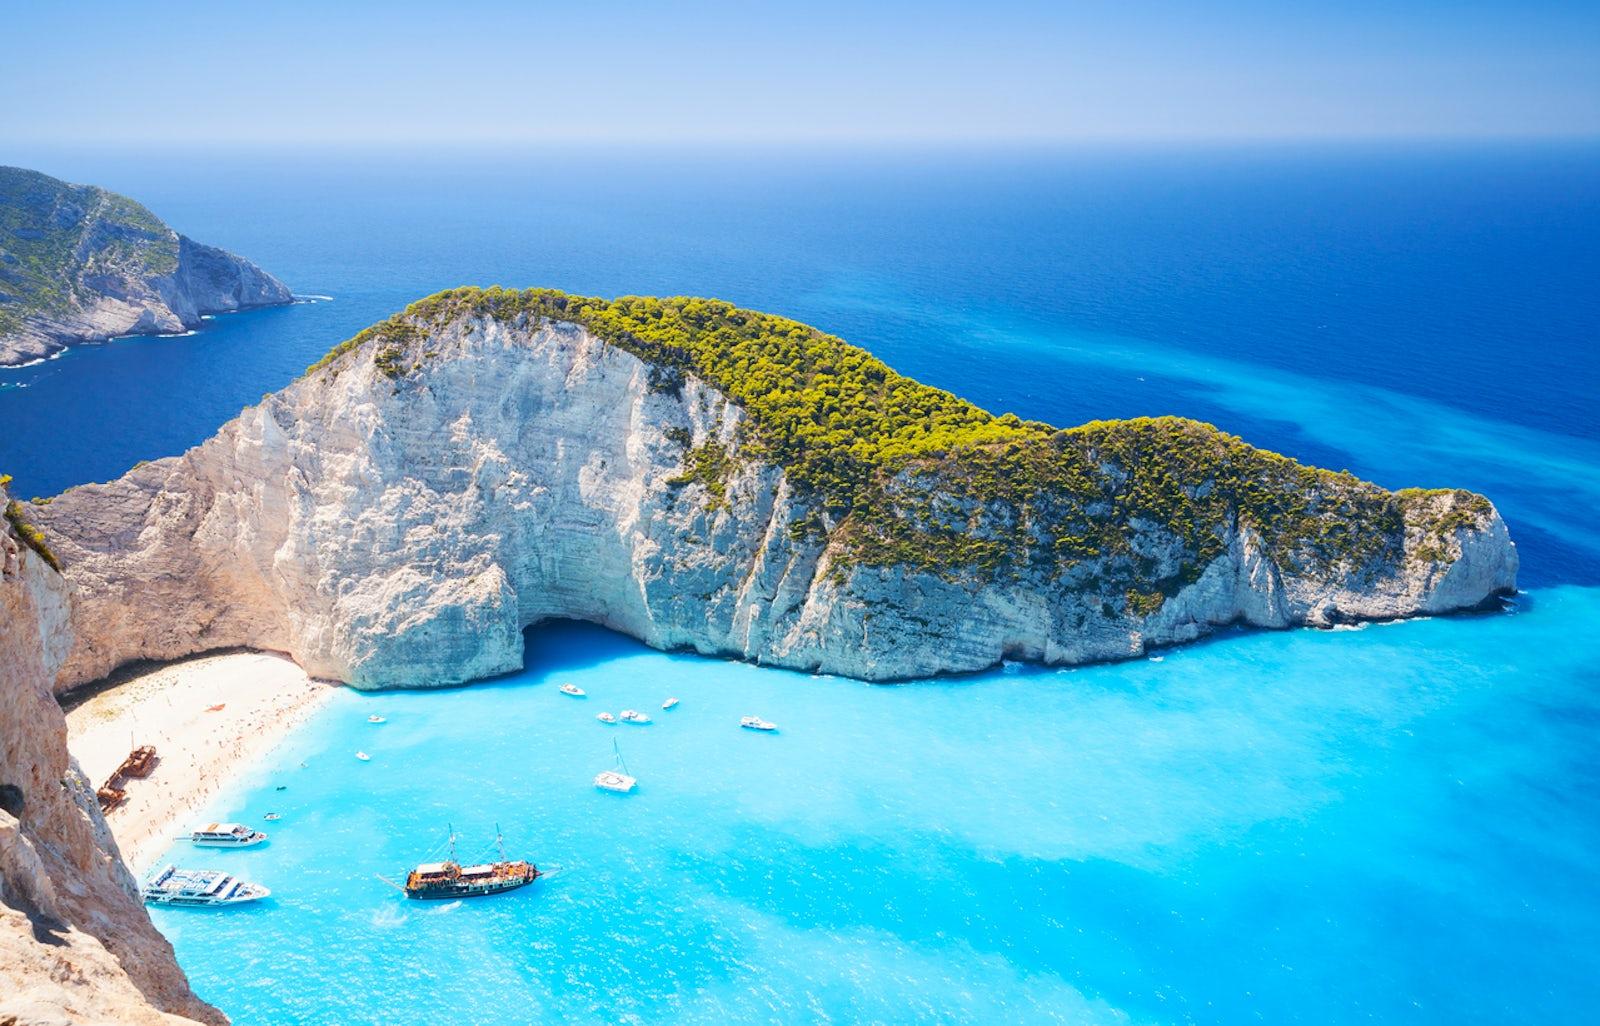 The story of the Zakynthos' Shipwreck beach